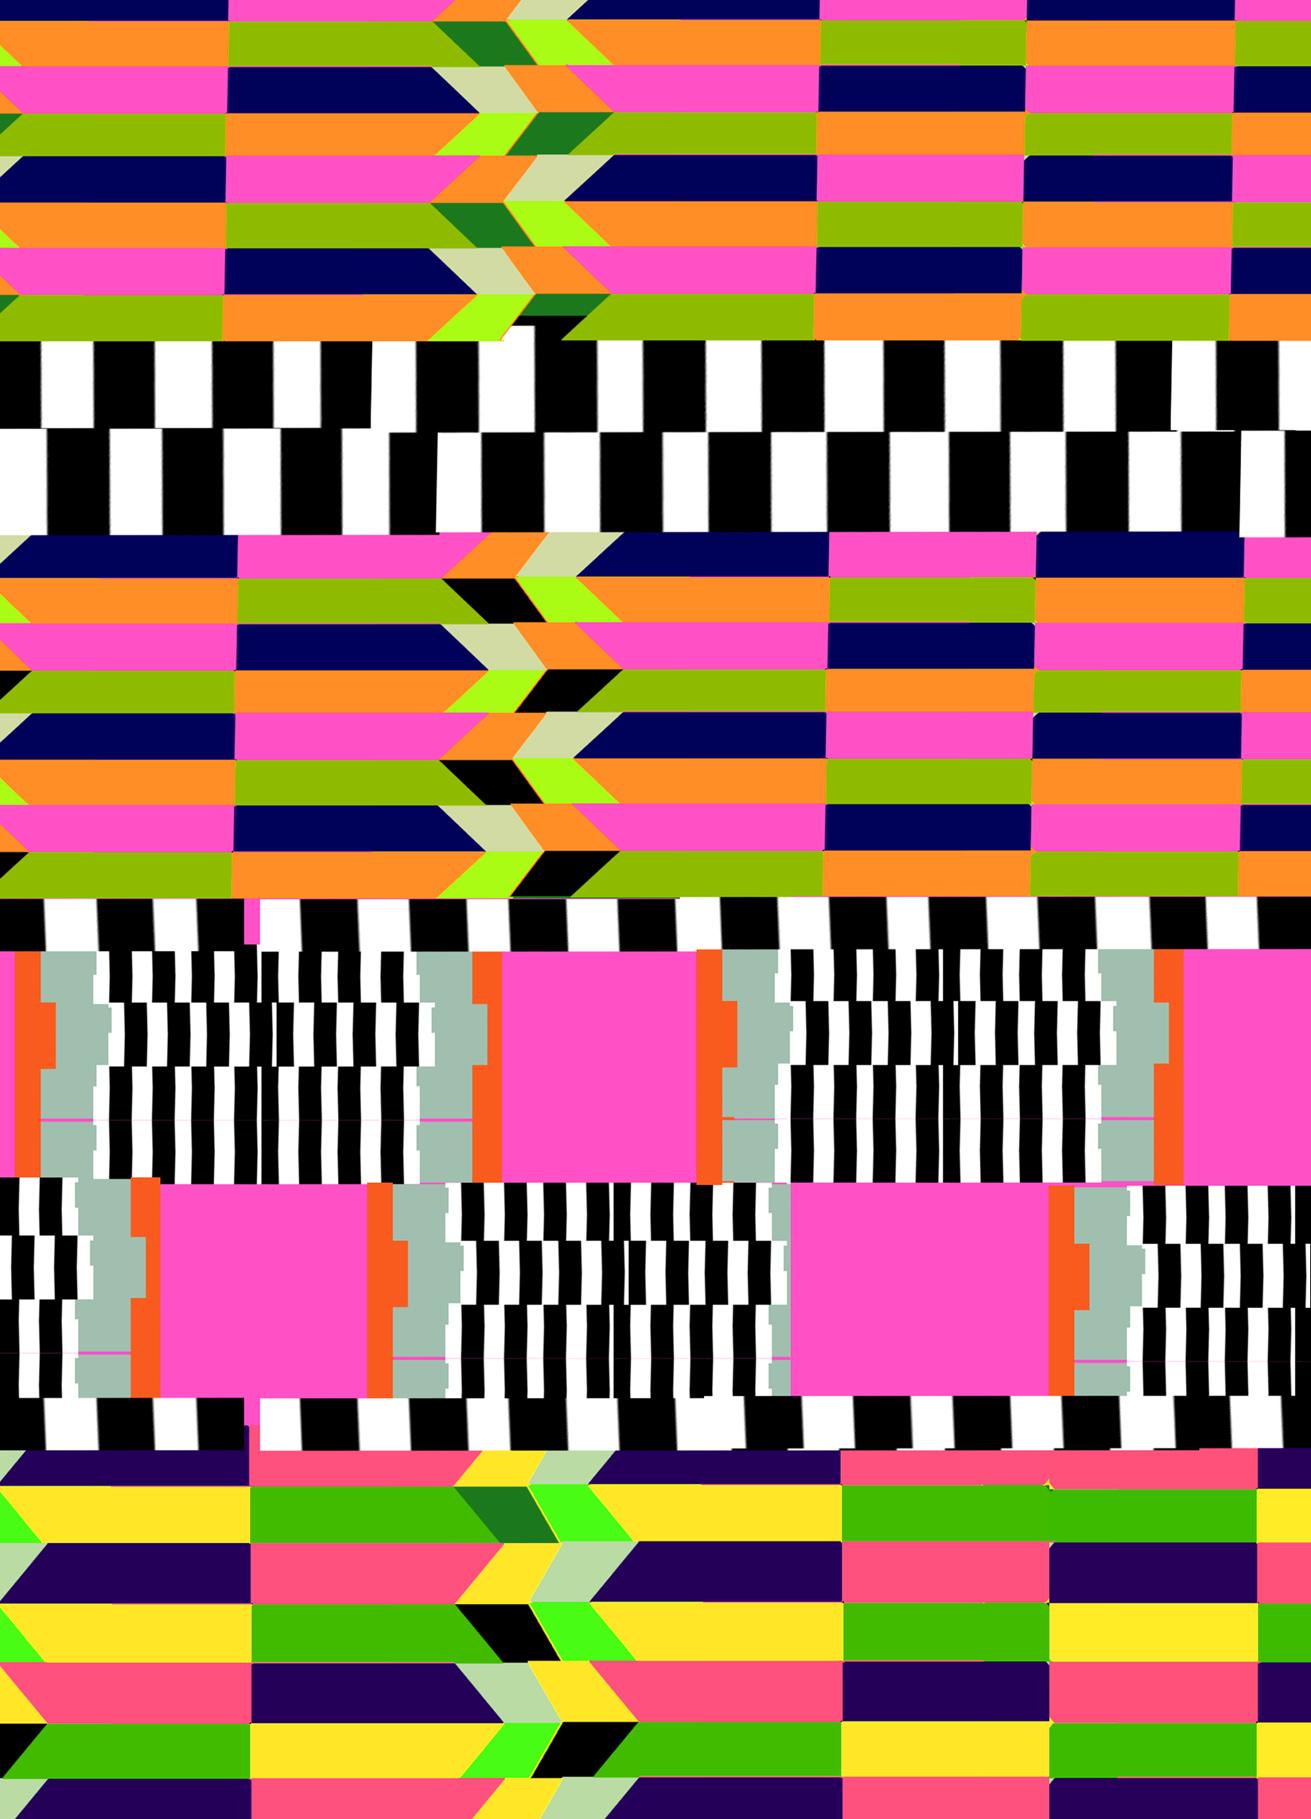 A6_Kartel_2.jpg